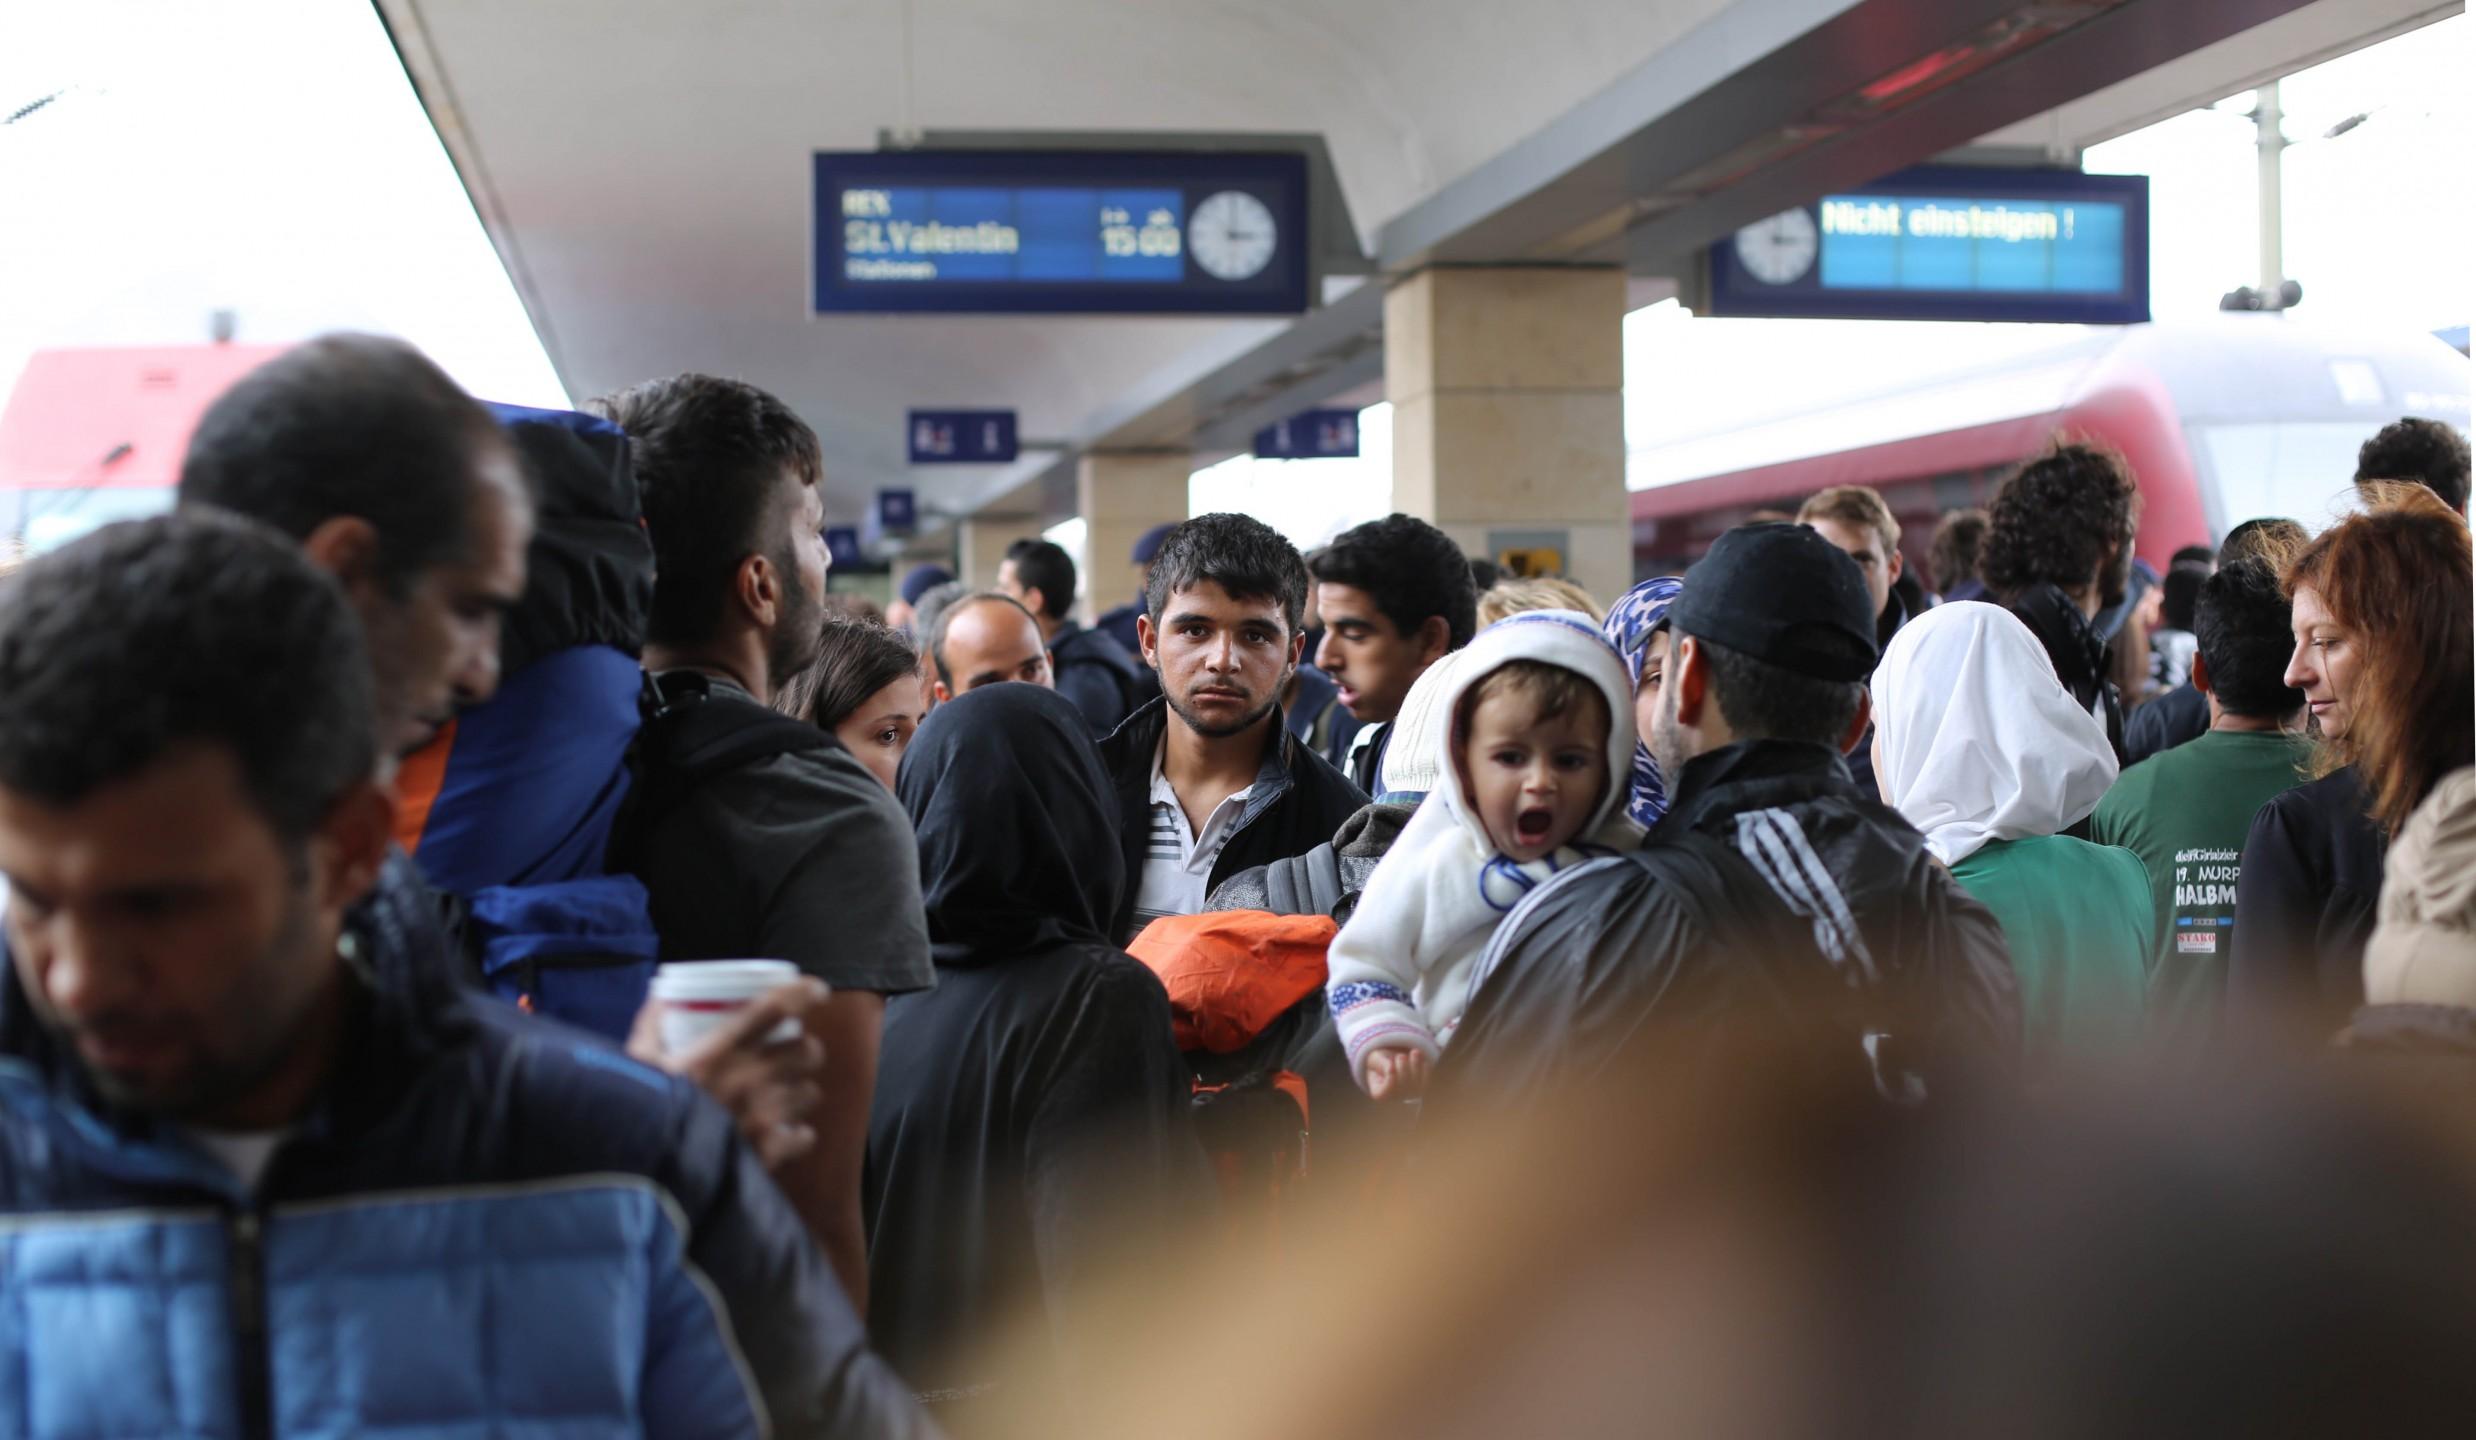 Syrische vluchtelingen in Wenen, wachtend op de trein